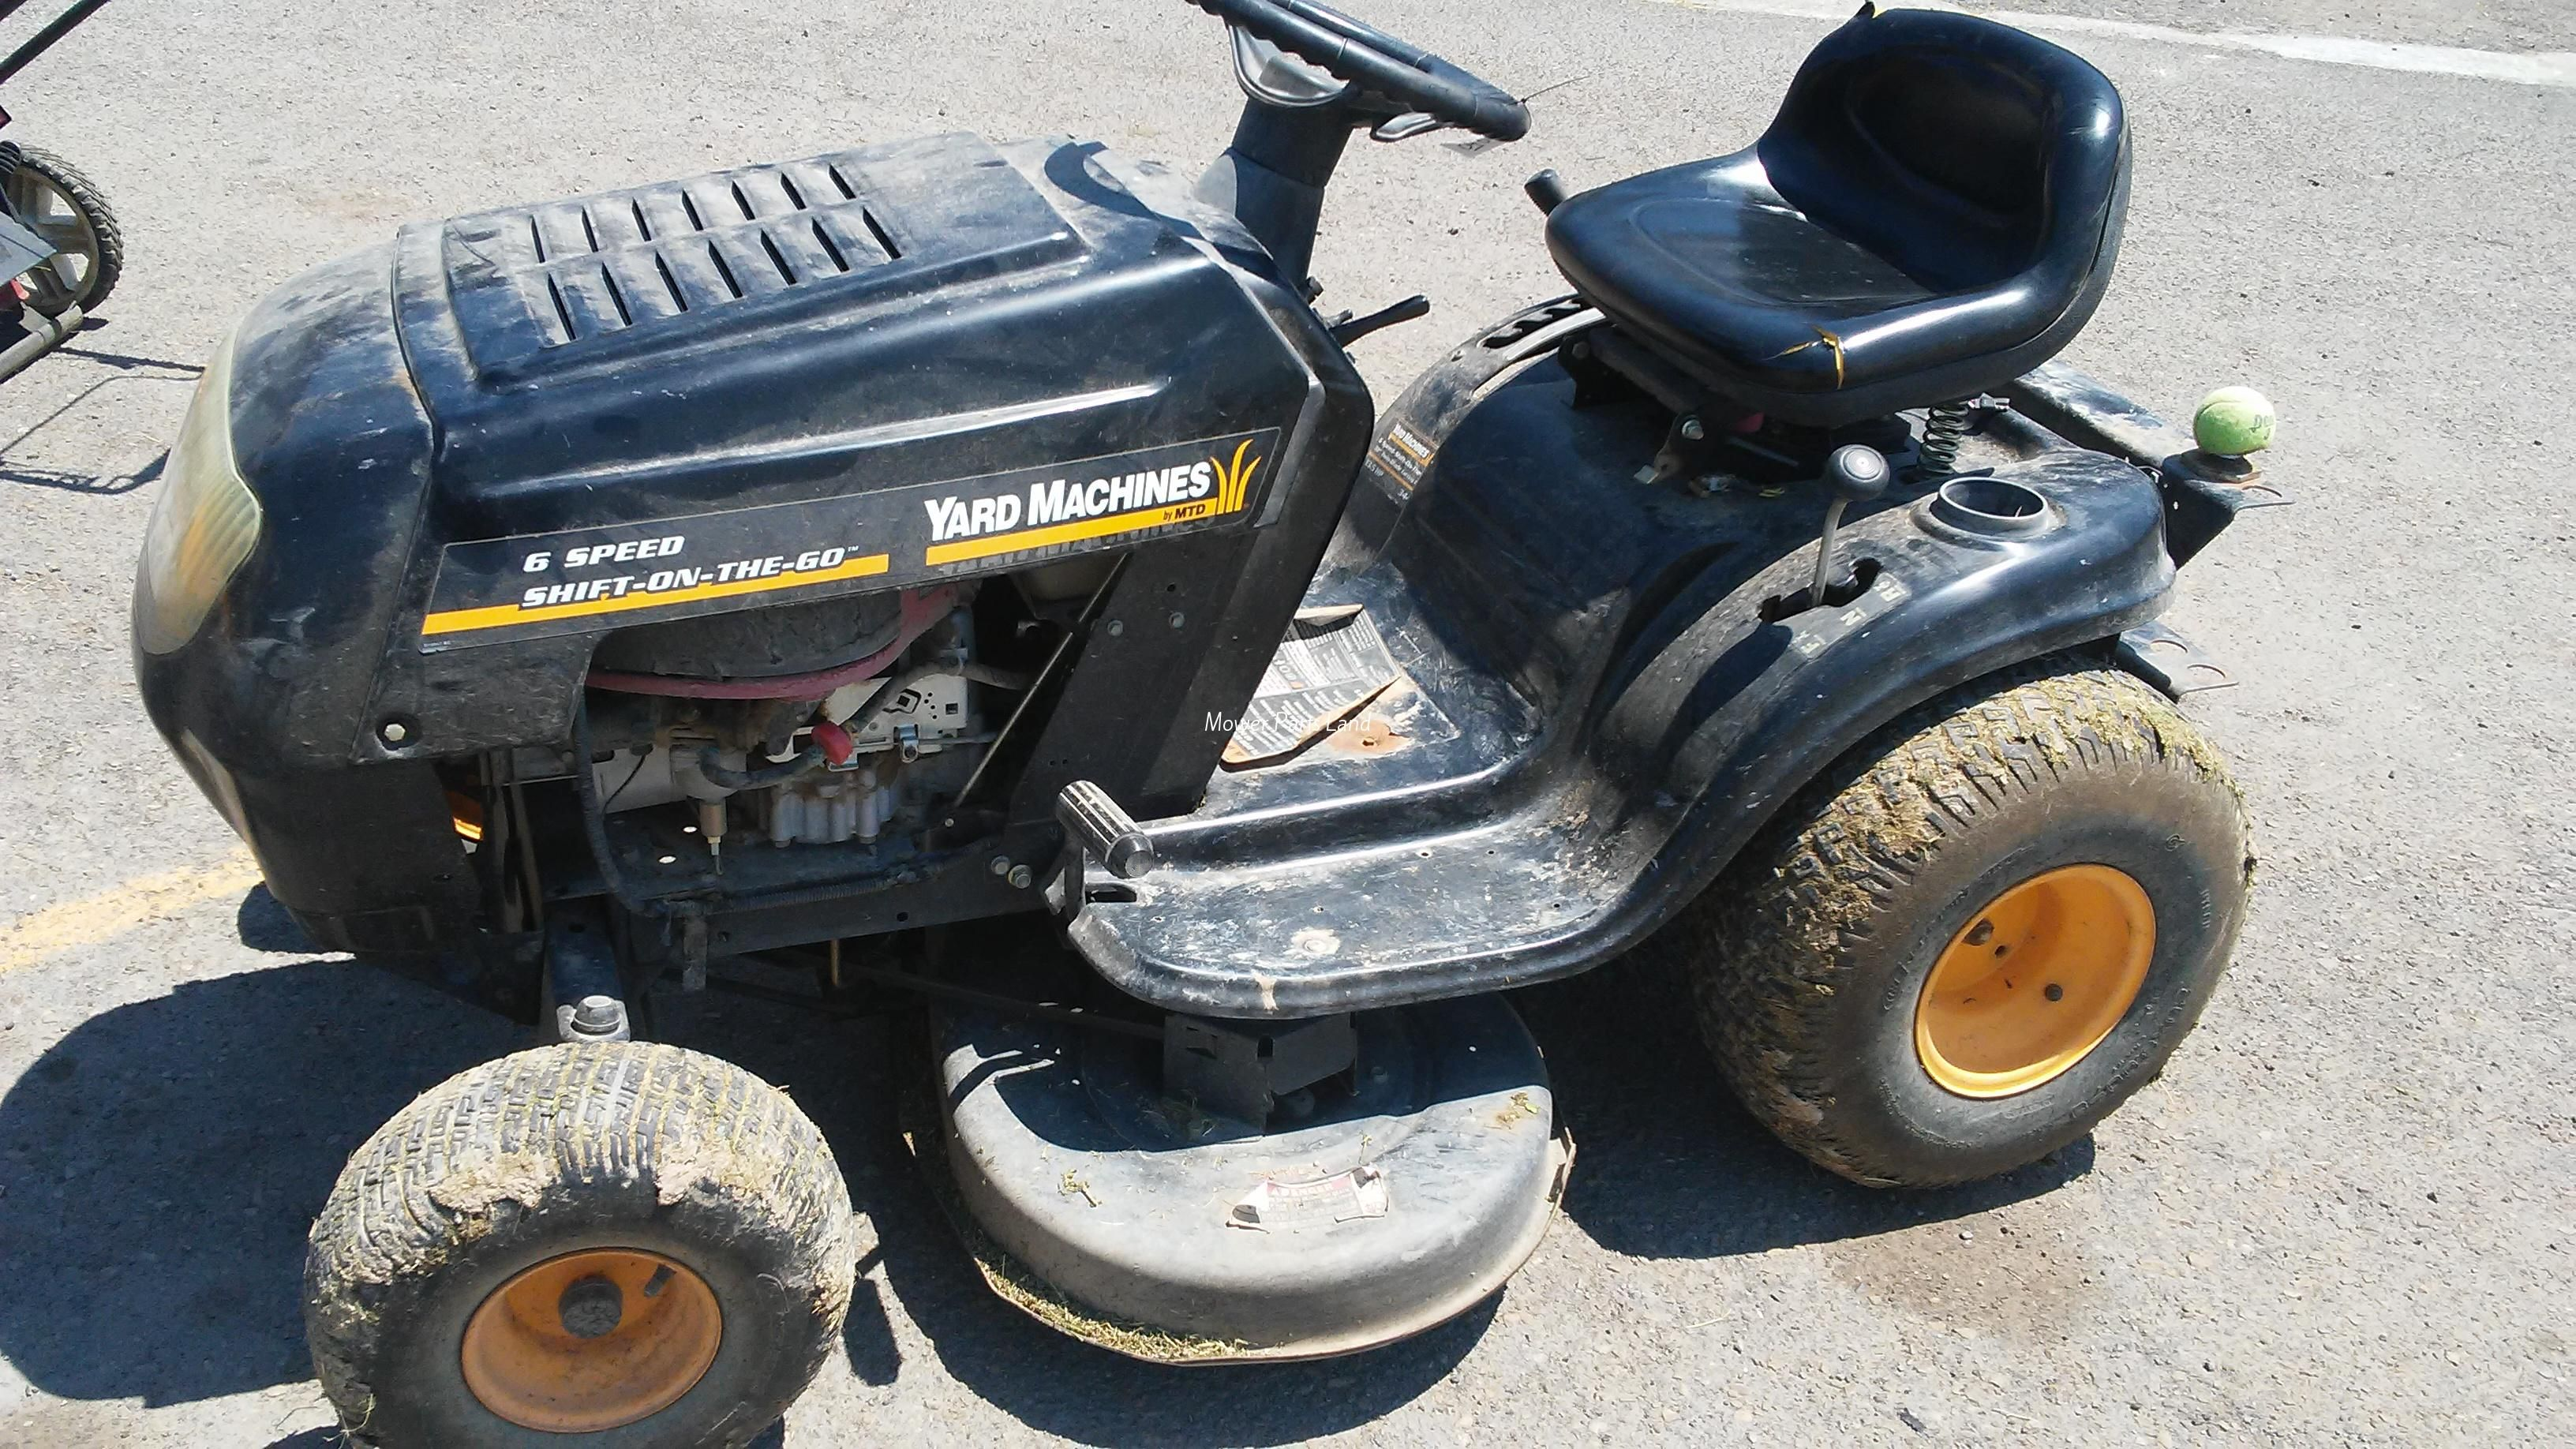 Yard Machine Parts >> Replaces Yard Machines Lawn Mower Model 13ac762f729 Carburetor